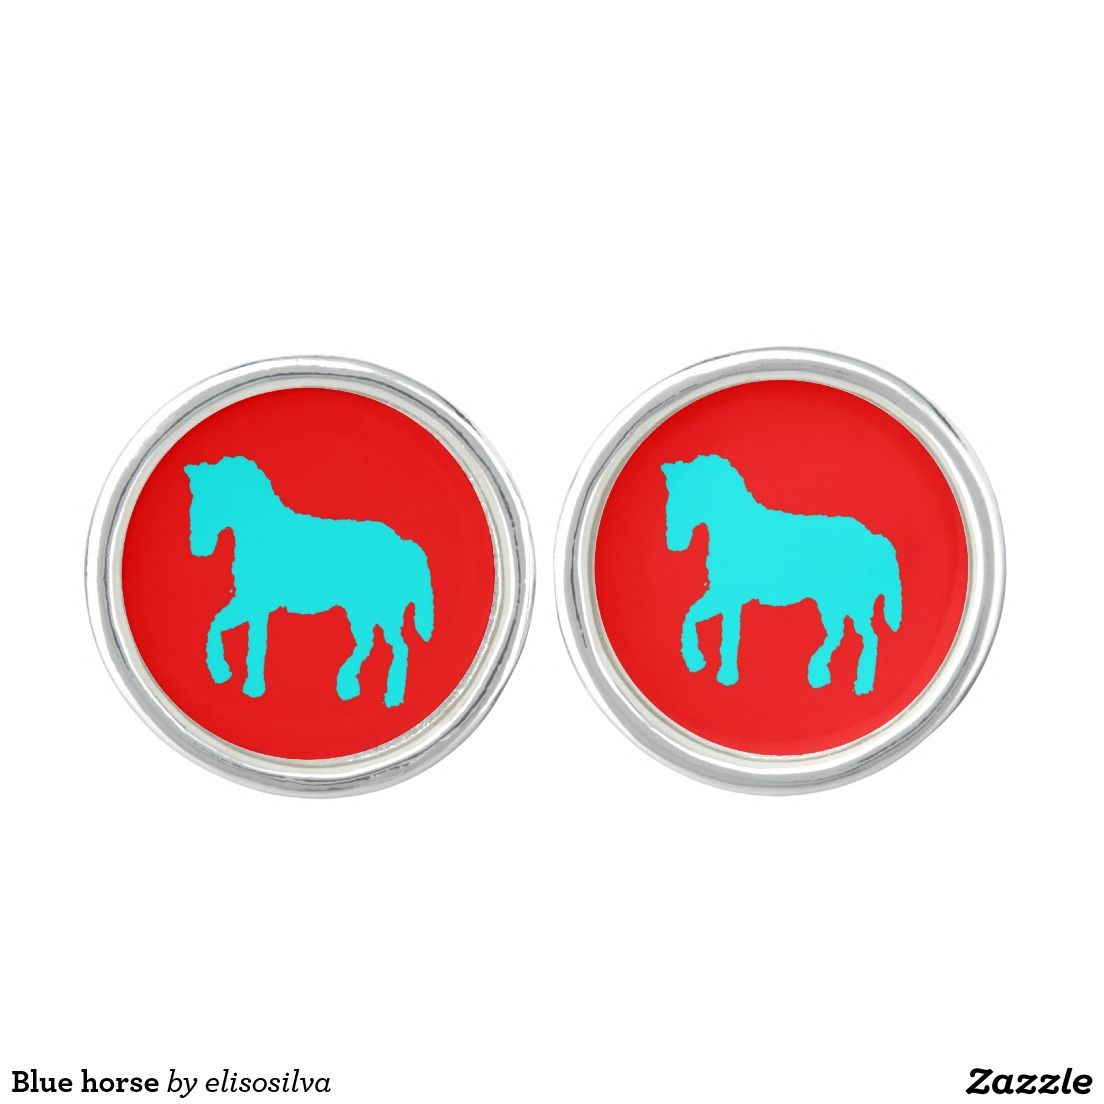 Blue horse mancuernillas